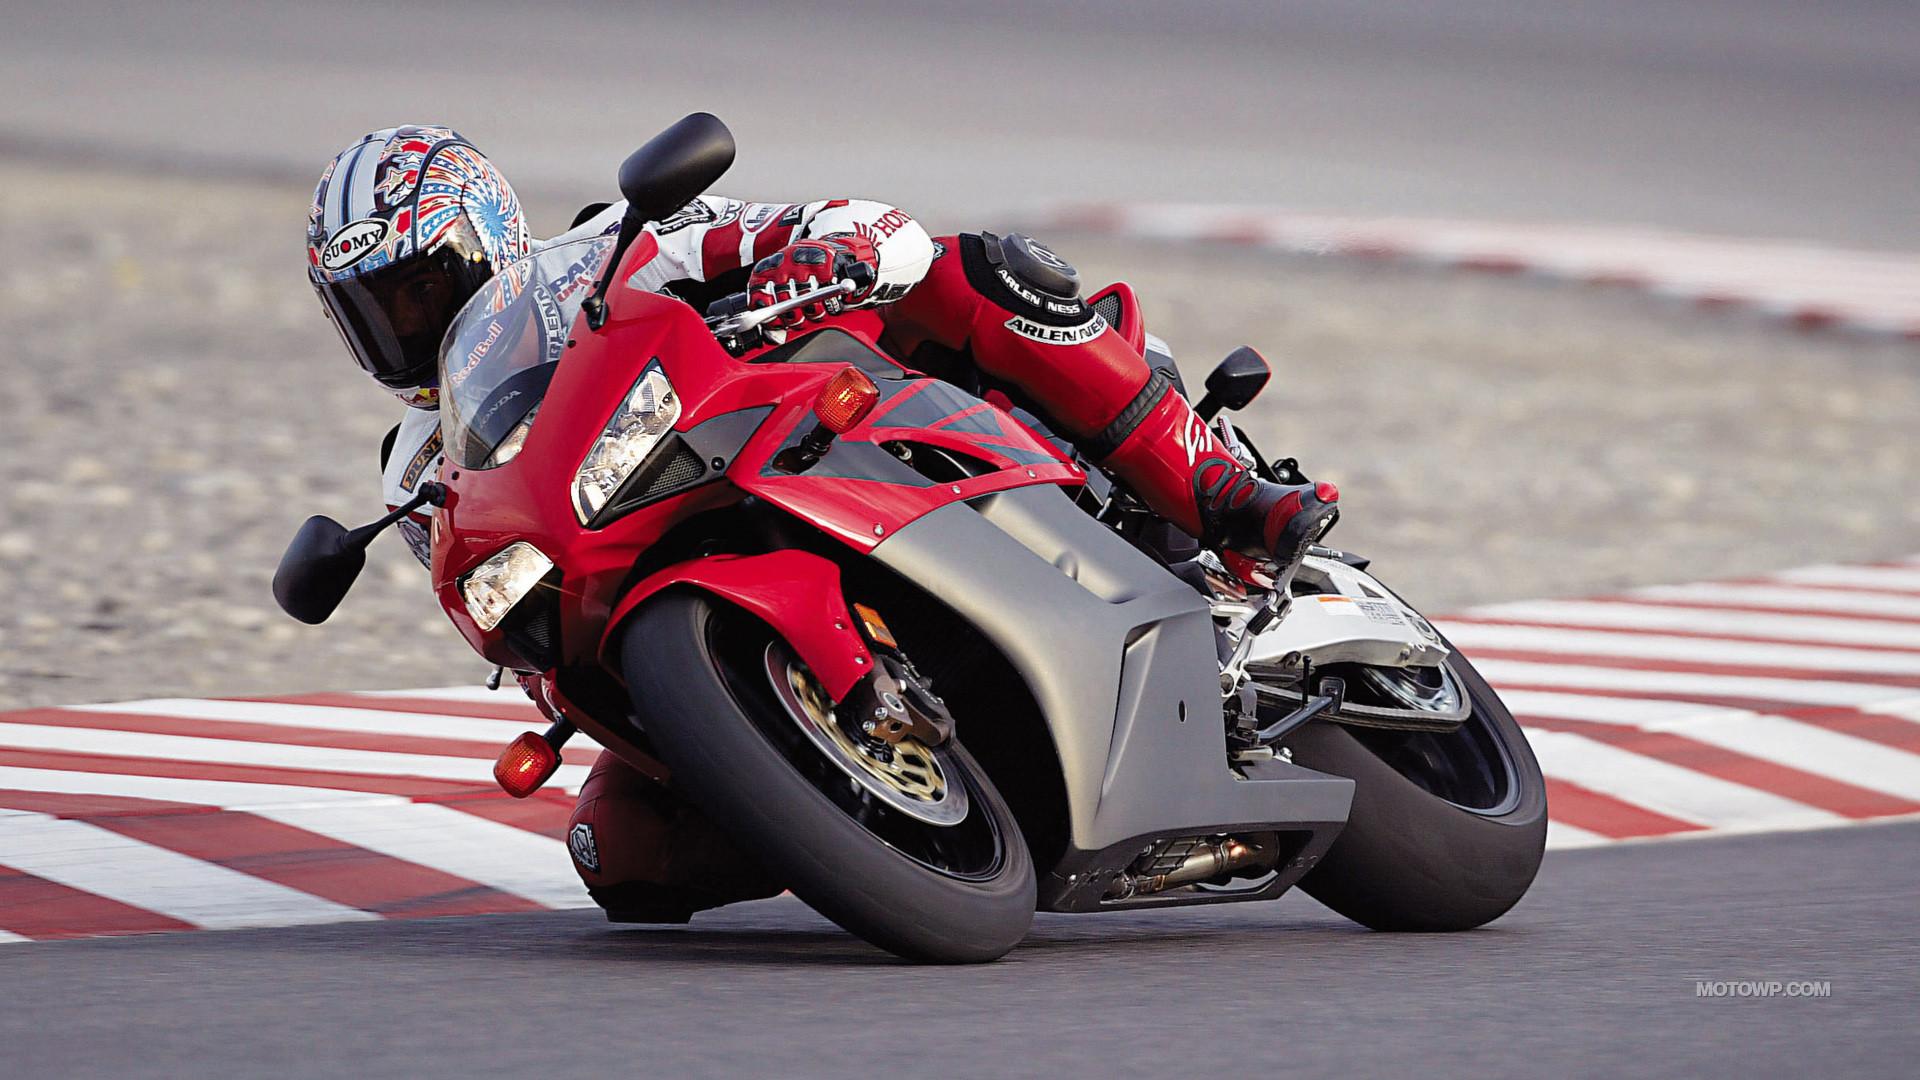 Res: 1920x1080, Motorcycles wallpapers Honda CBR1000RR ...